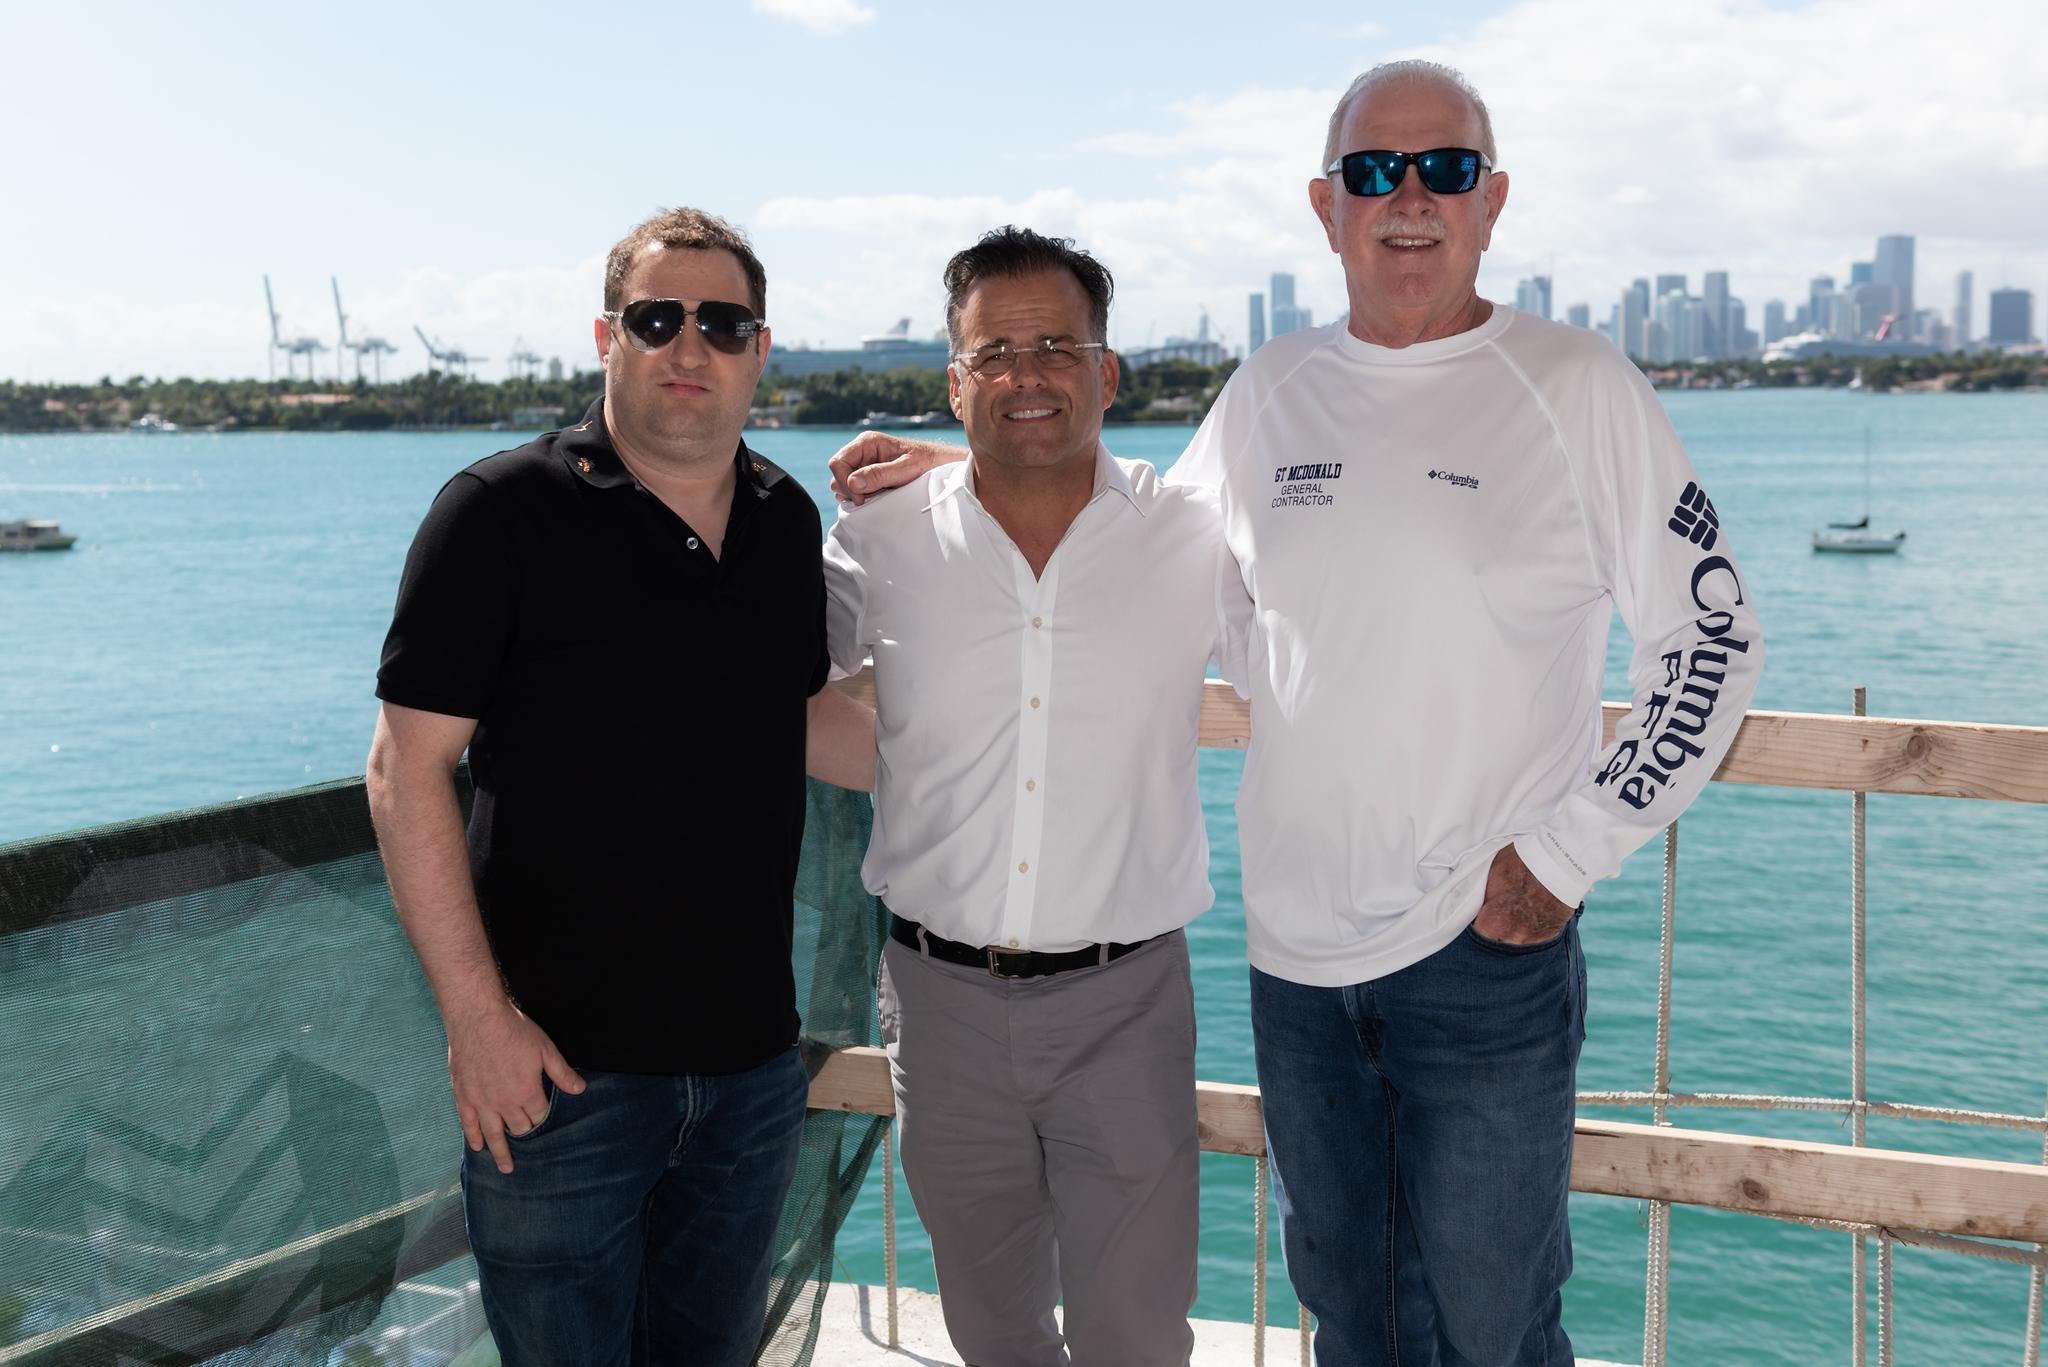 Michael Stern, Kobi Karp, Jerry McDonald